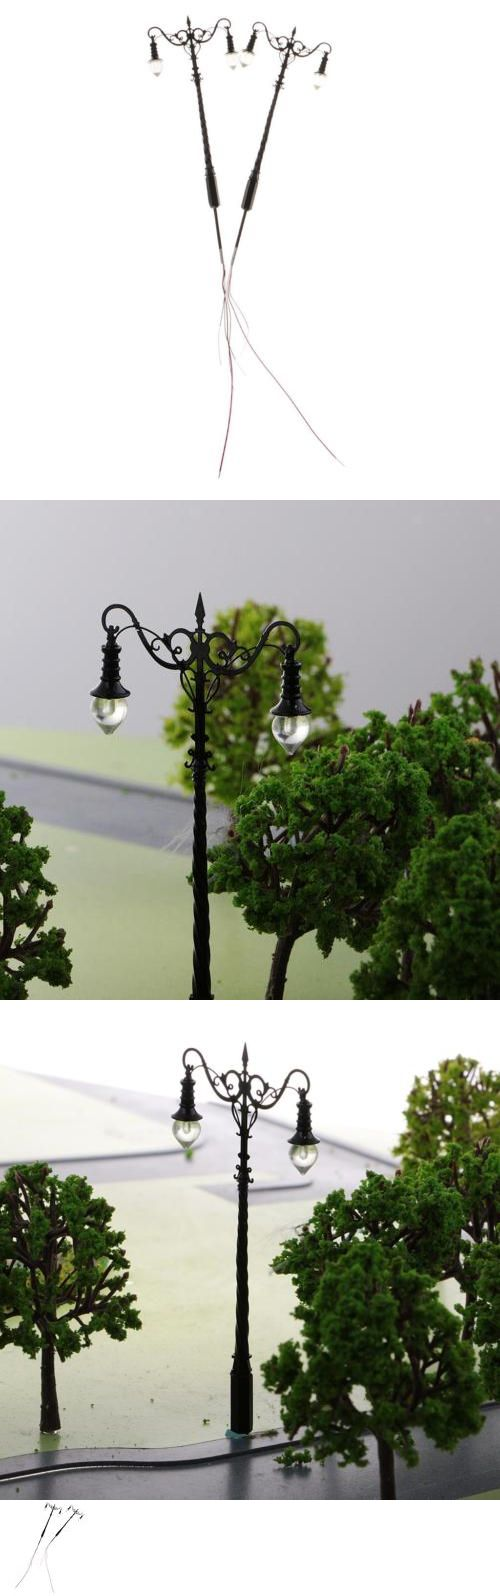 2pcs 1:64 S Scale Model Railway Layout Lights Street Courtyard Lamp Toys DIY